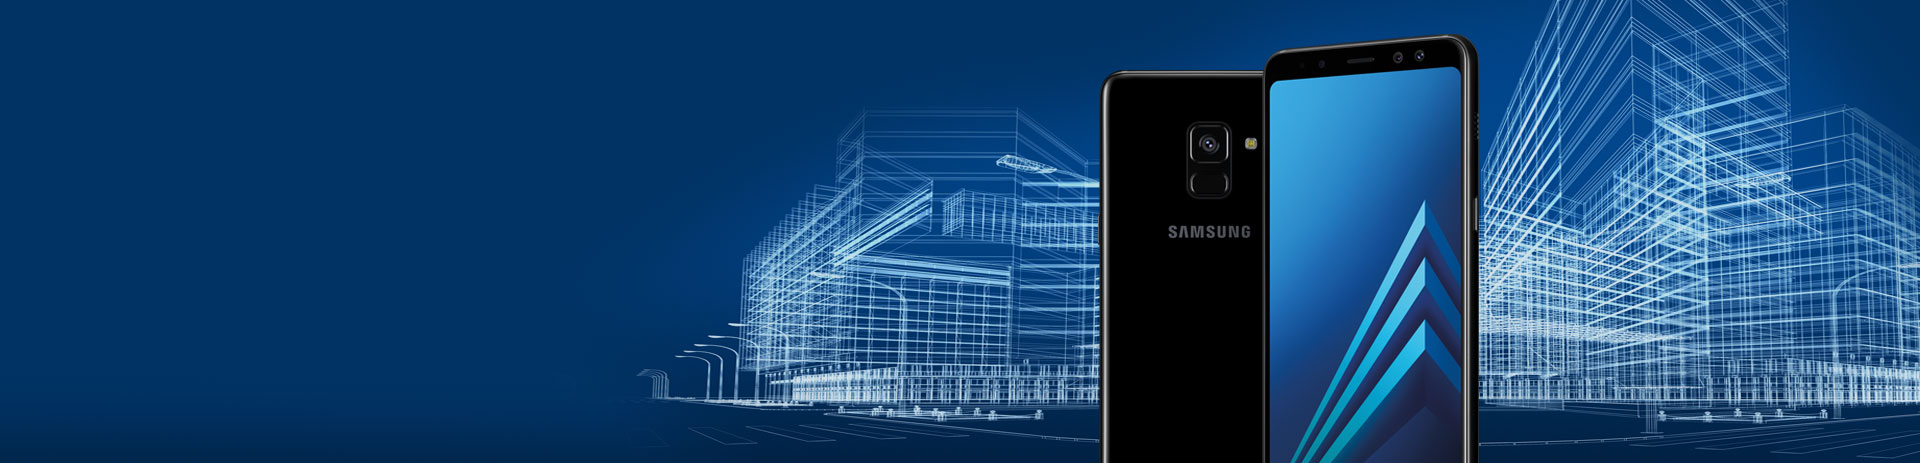 Samsung Galaxy A8 Business Edition